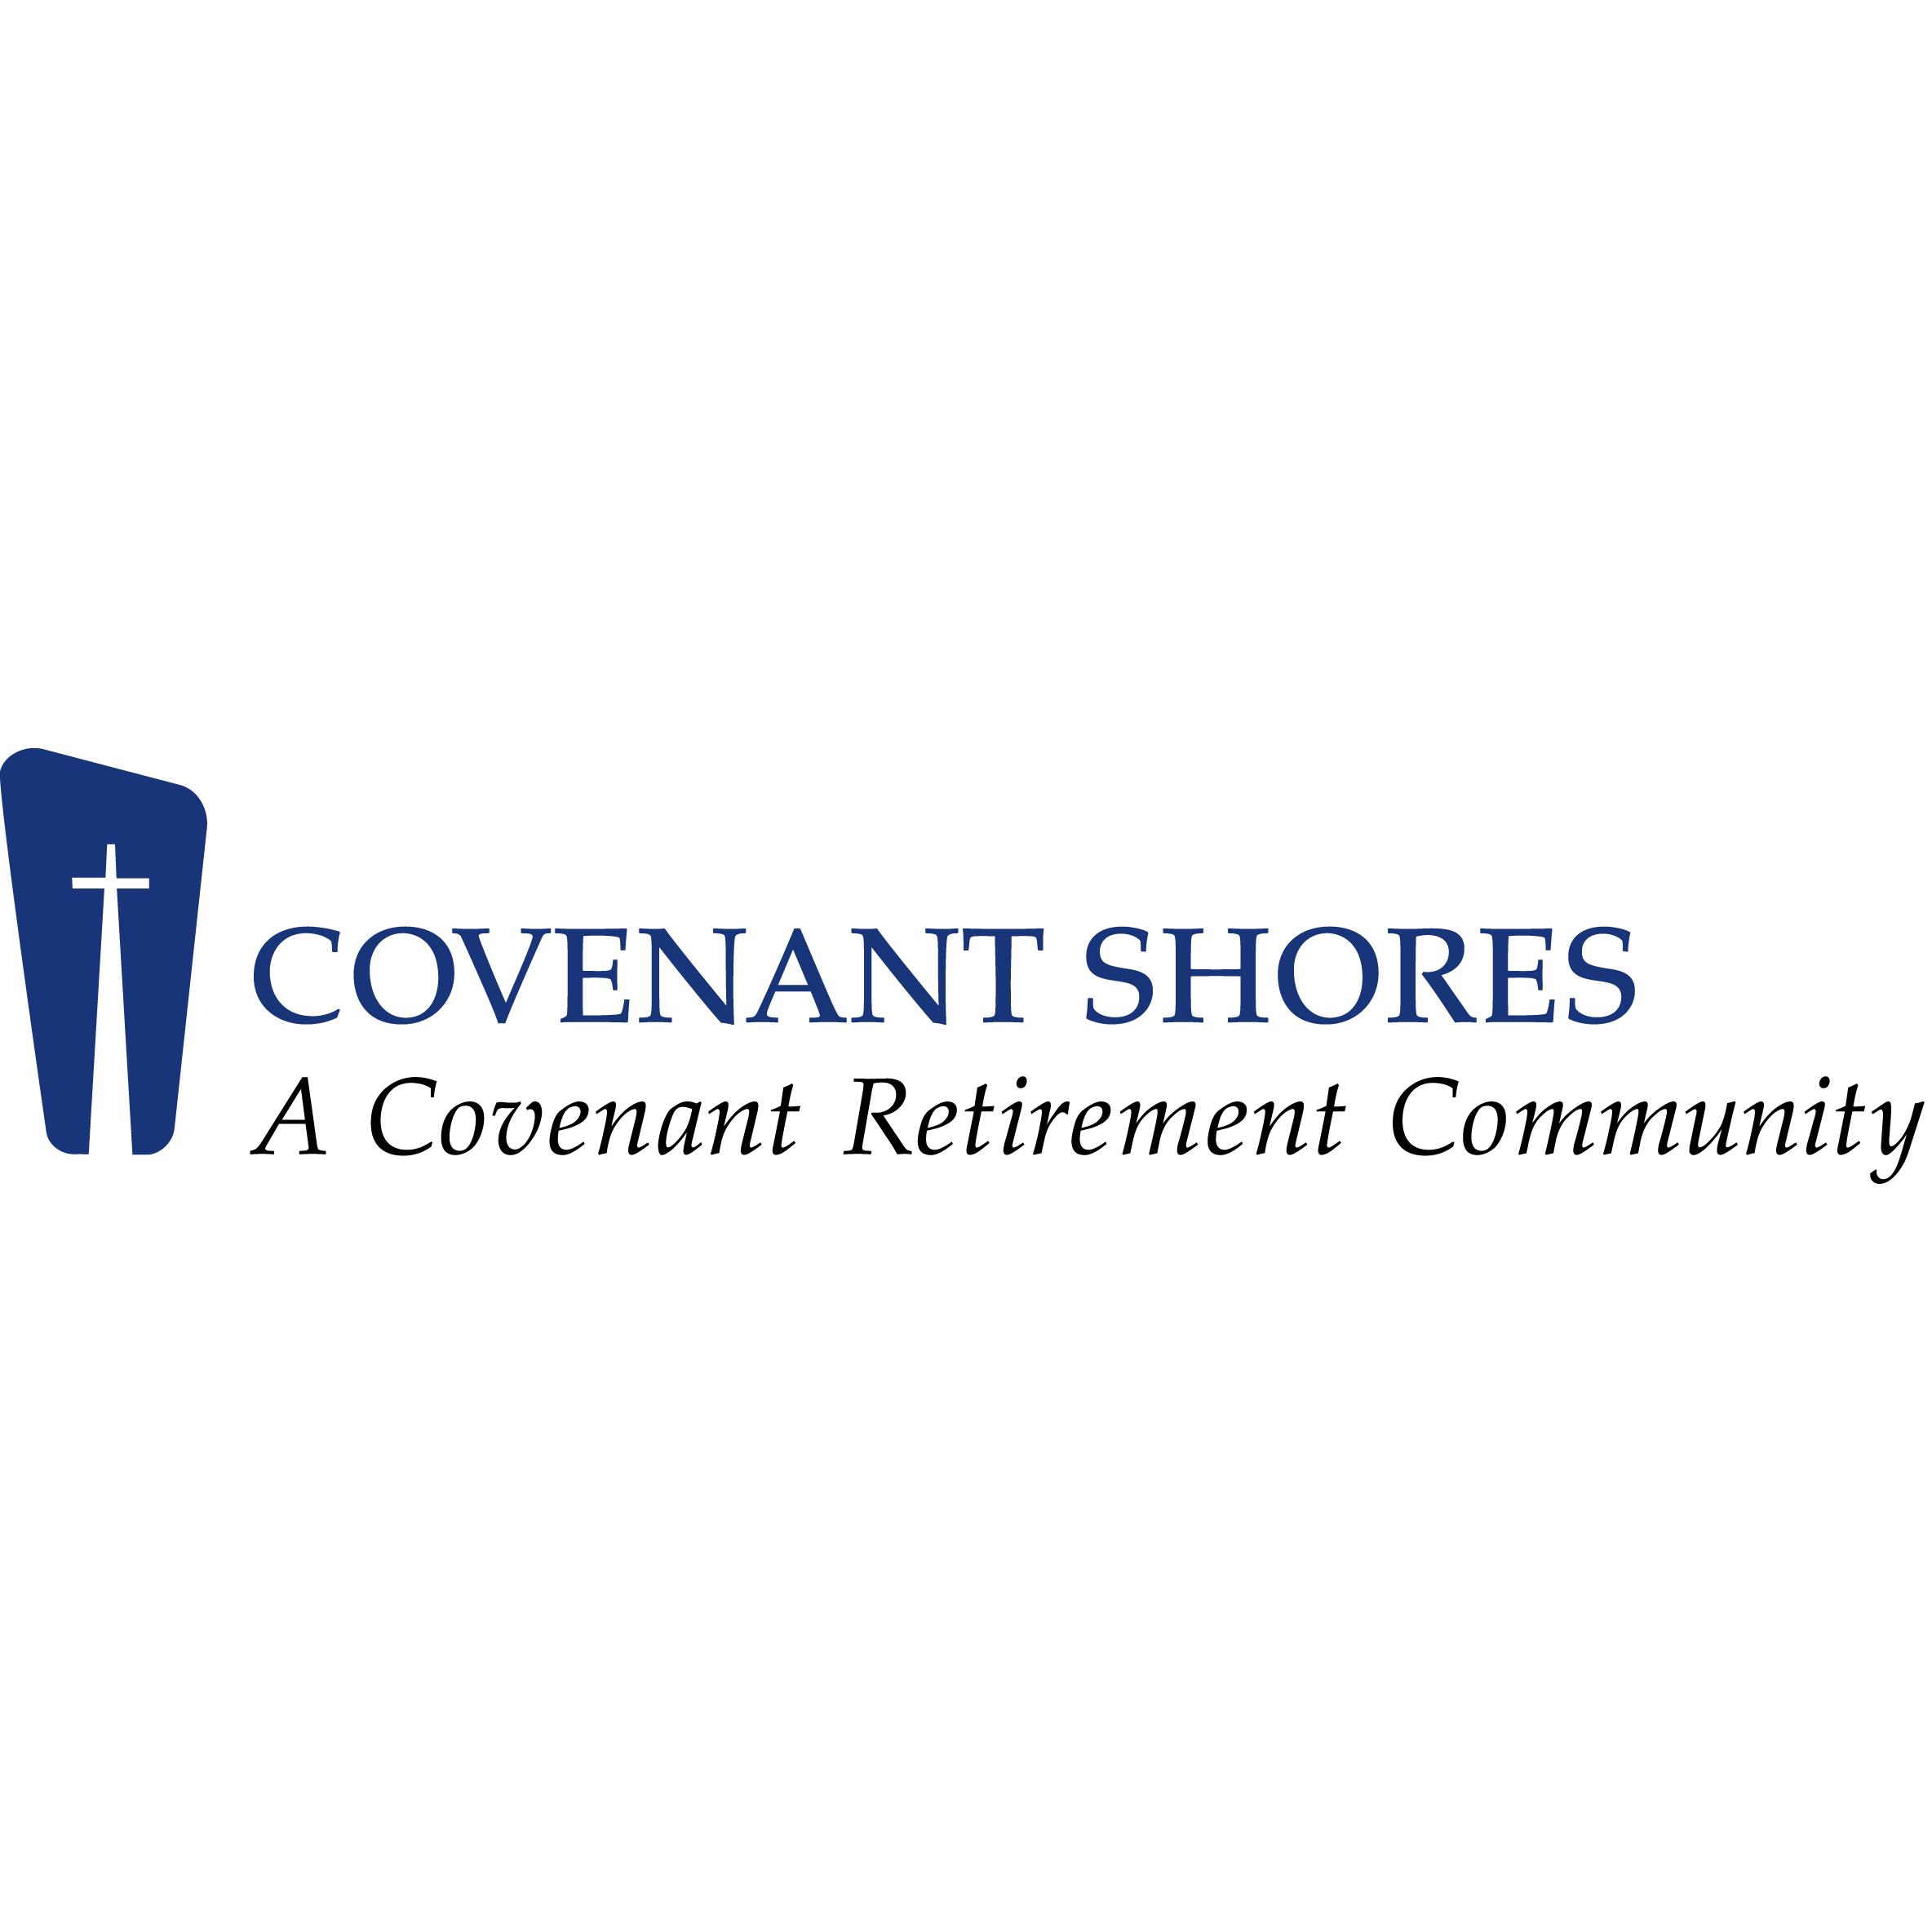 Covenant Shores - Mercer Island, WA - Retirement Communities